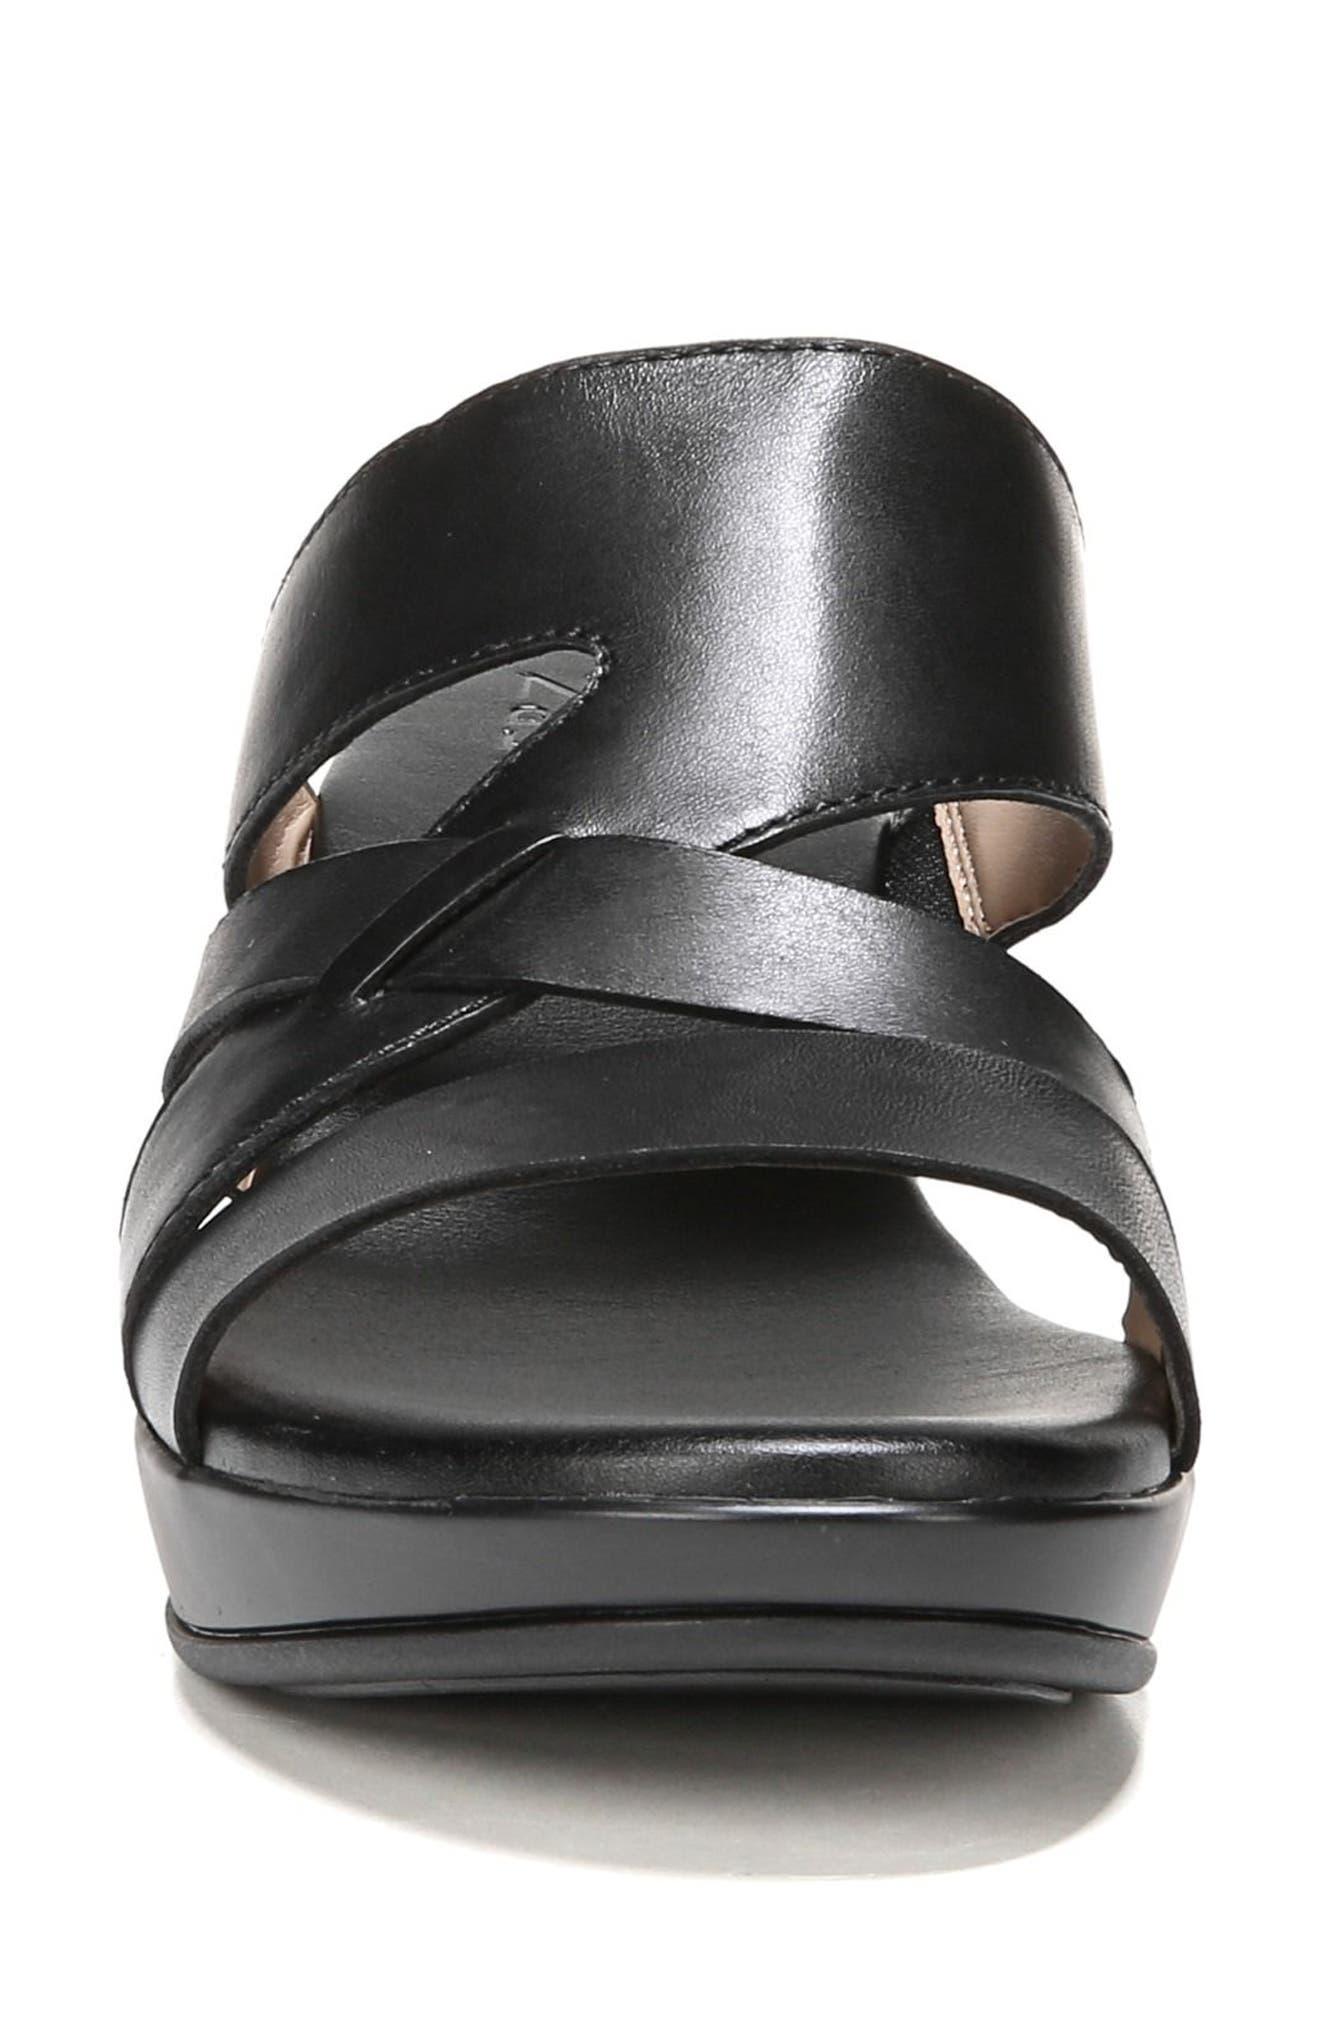 Vivy Wedge Sandal,                             Alternate thumbnail 4, color,                             BLACK LEATHER